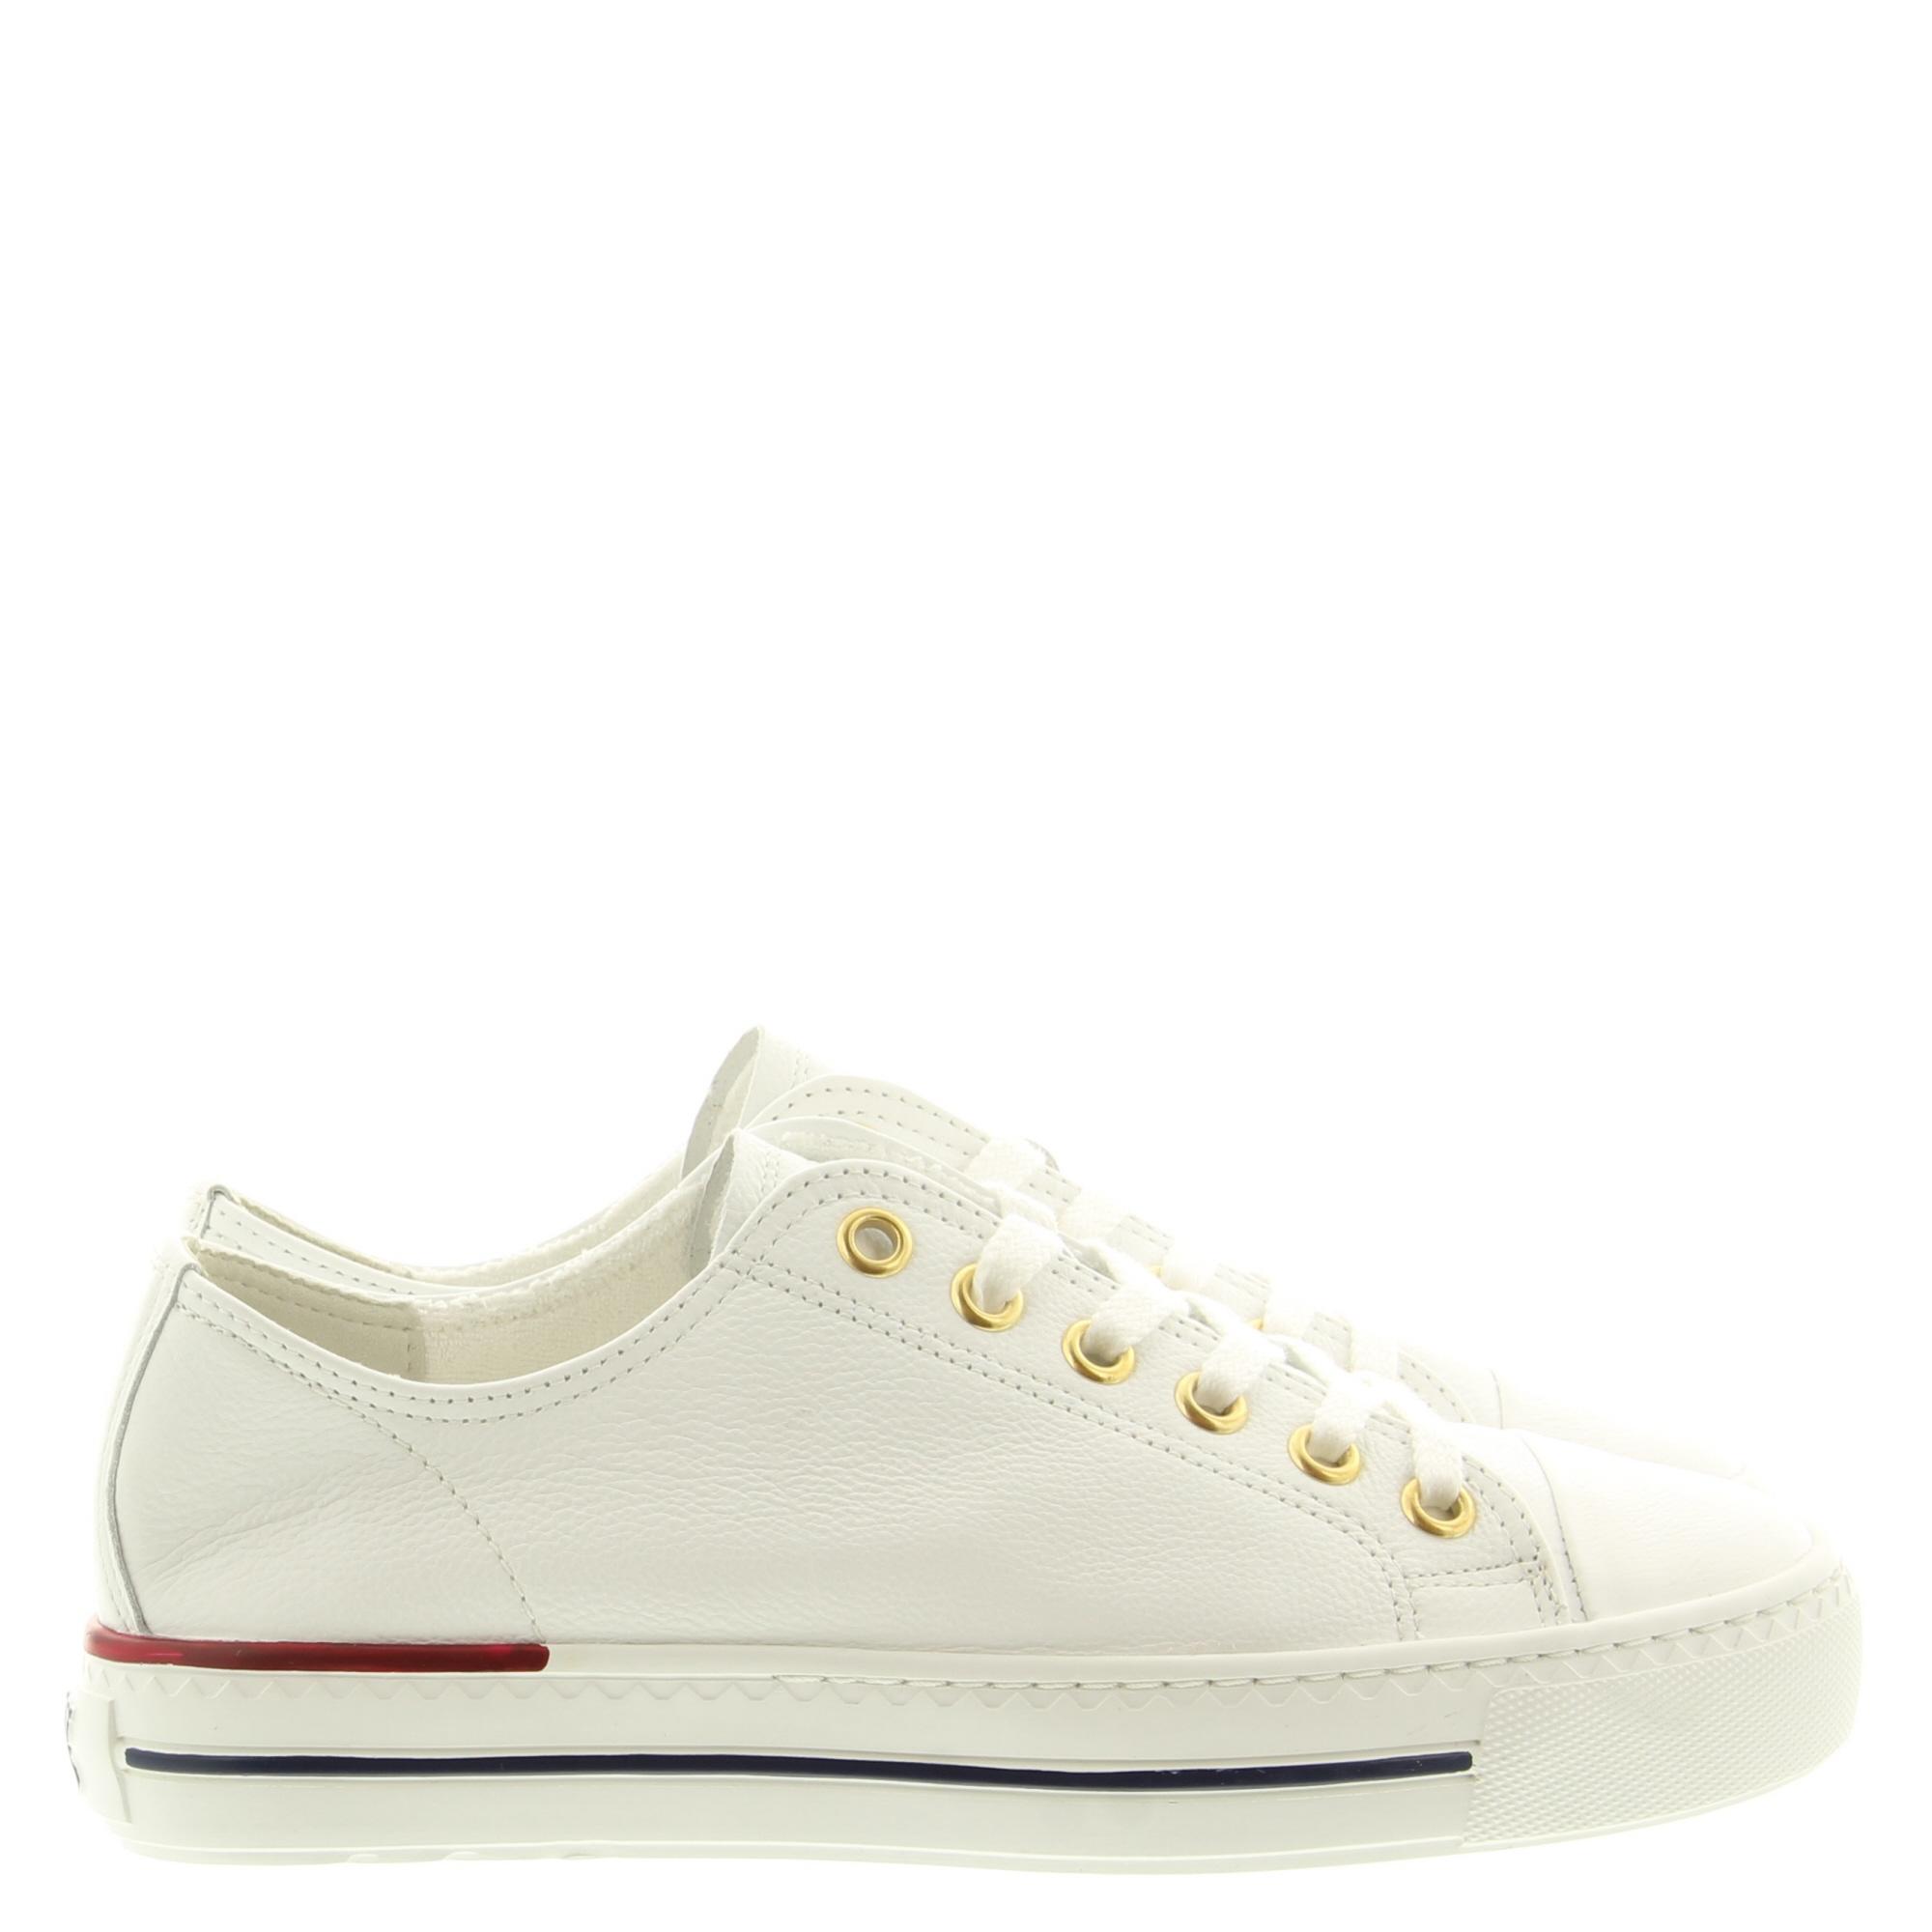 Paul Green 4977 108 White